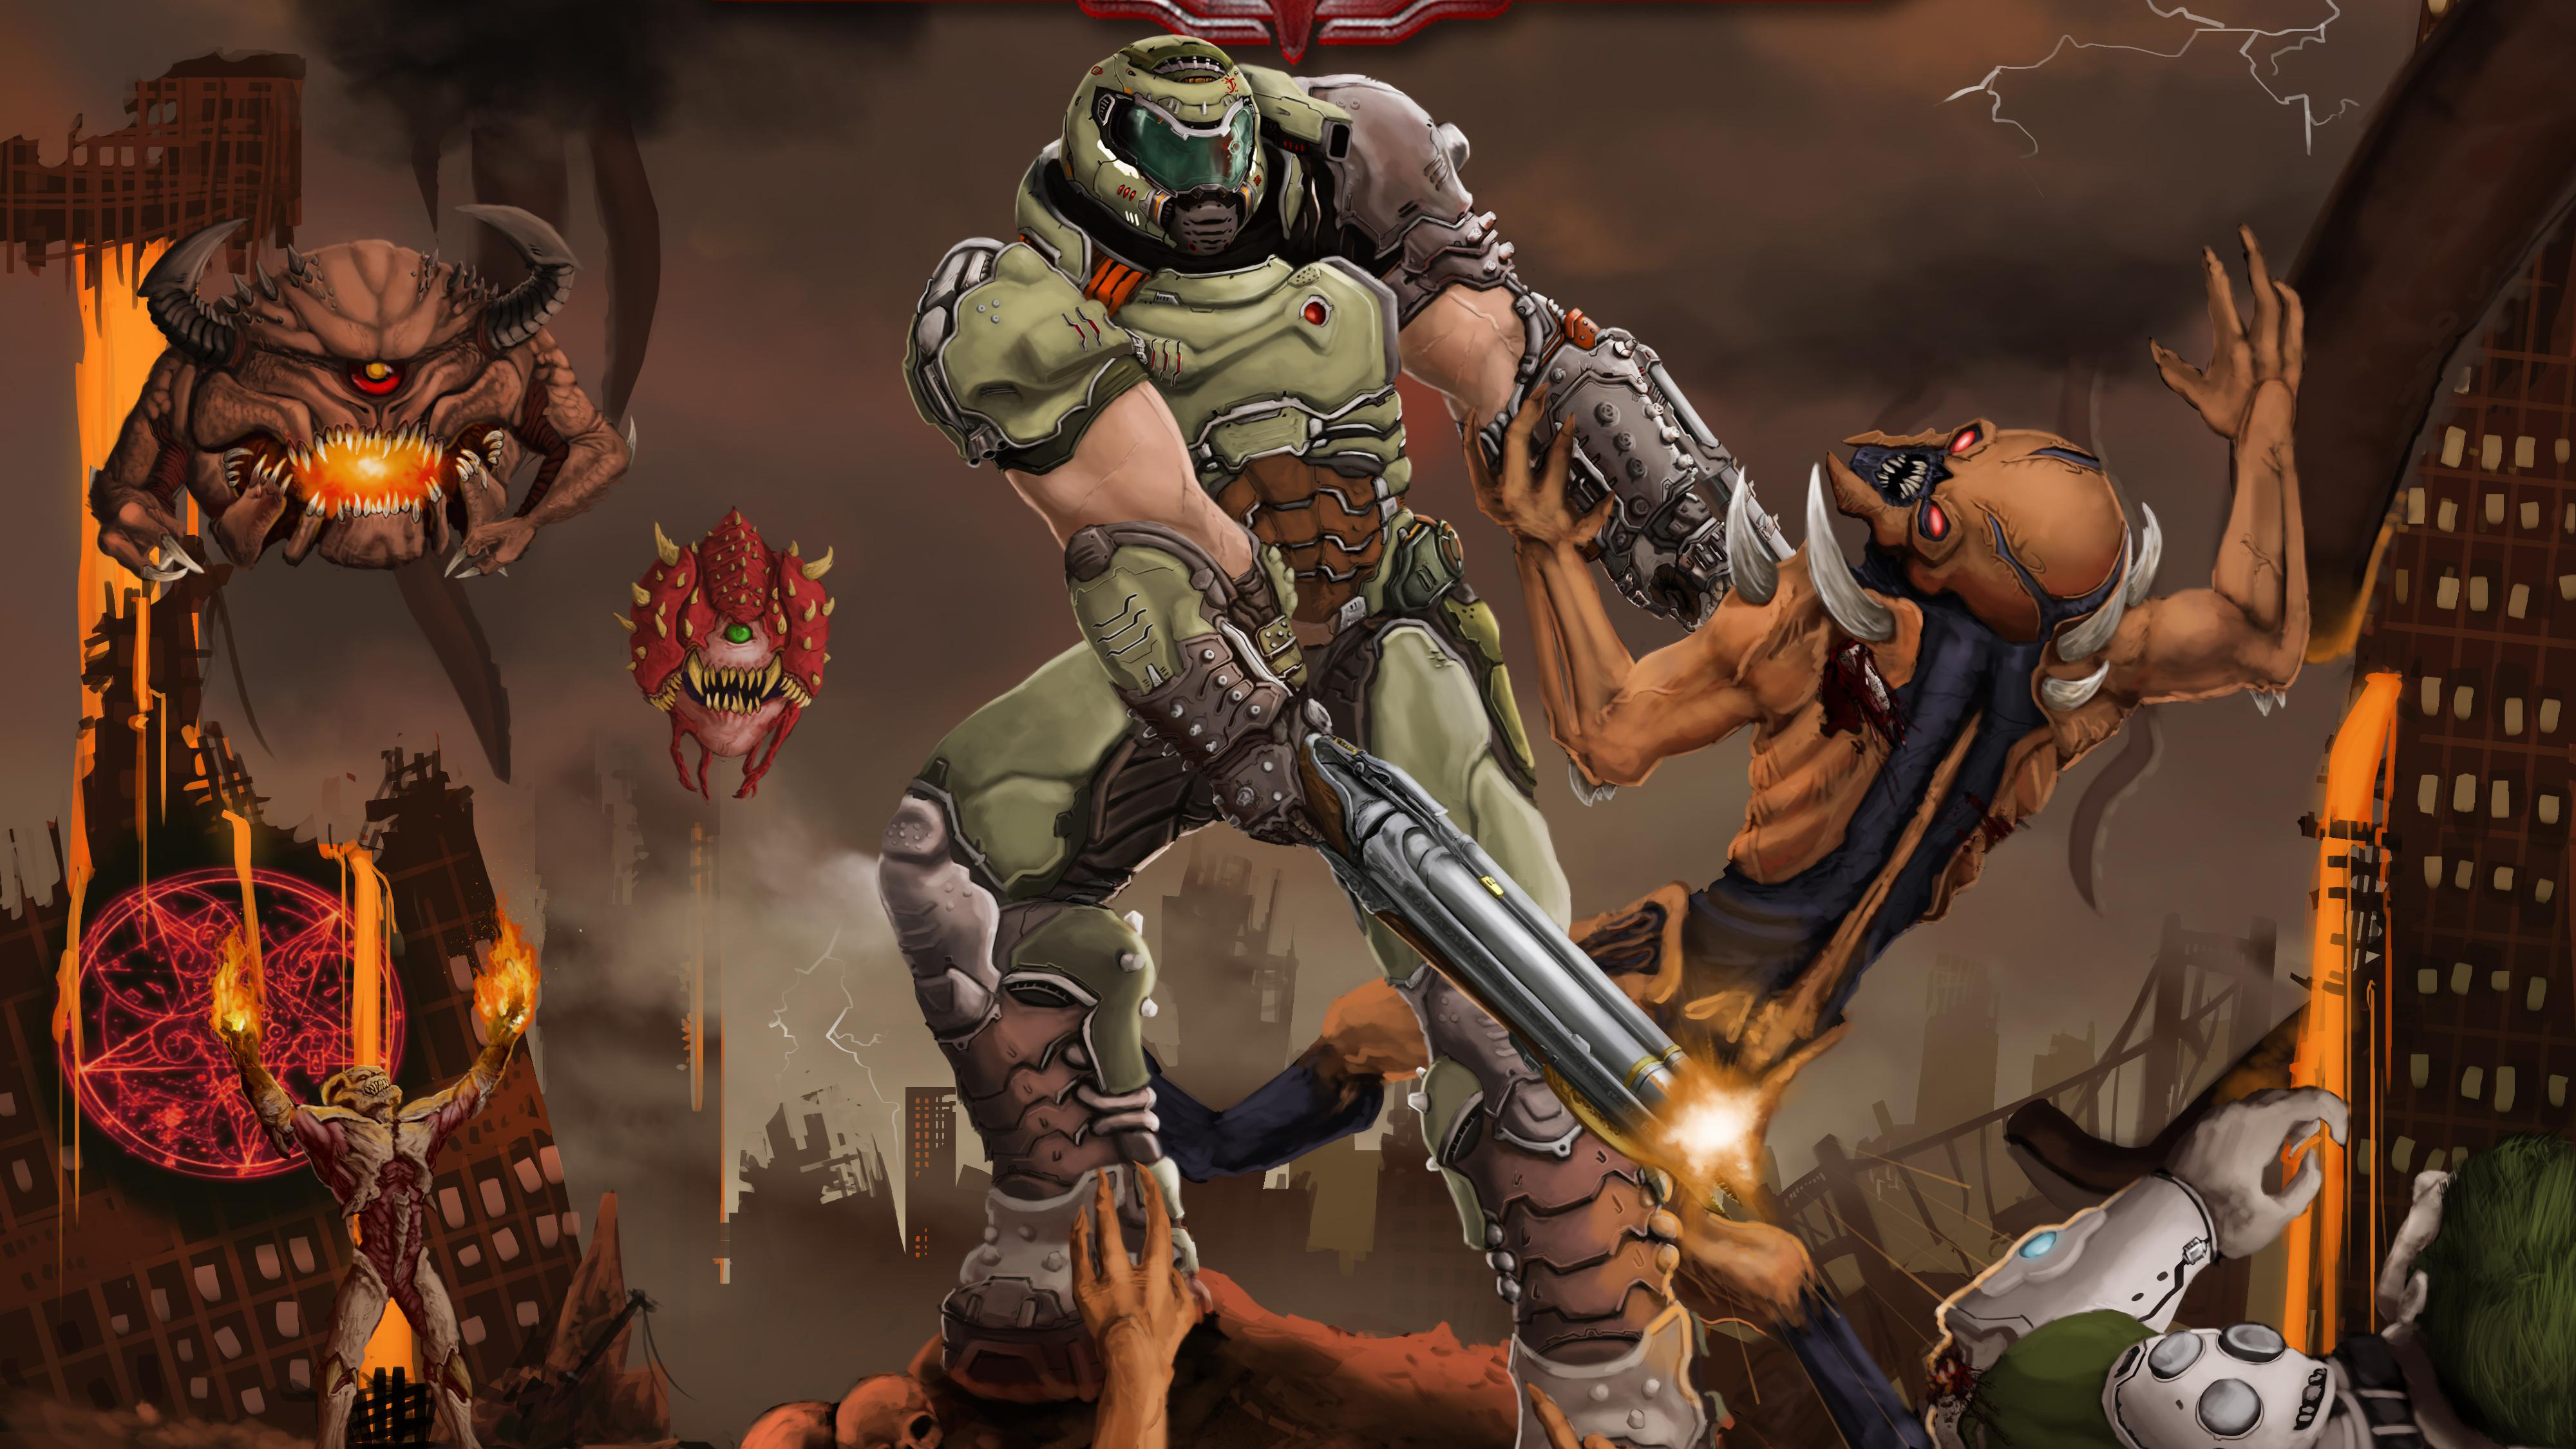 Doom Eternal 4k Hd Games 4k Wallpapers Images Backgrounds